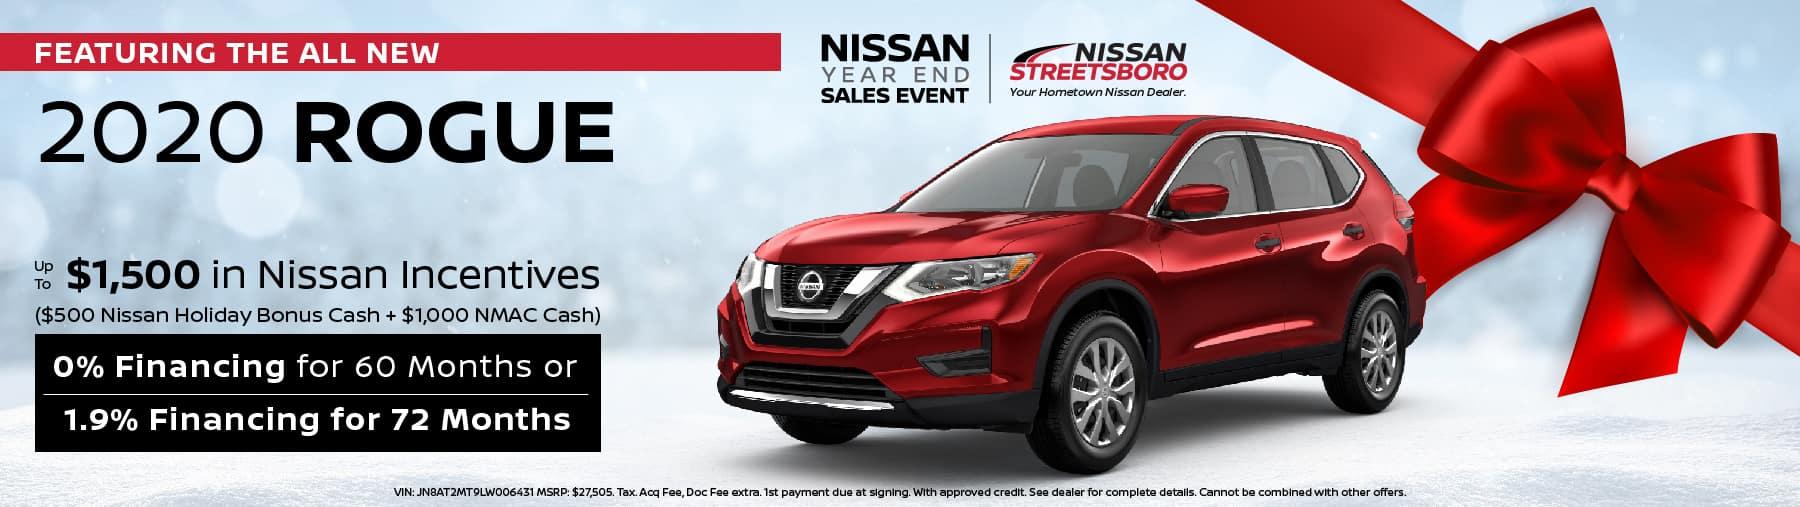 2020 Nissan Rogue Incentives